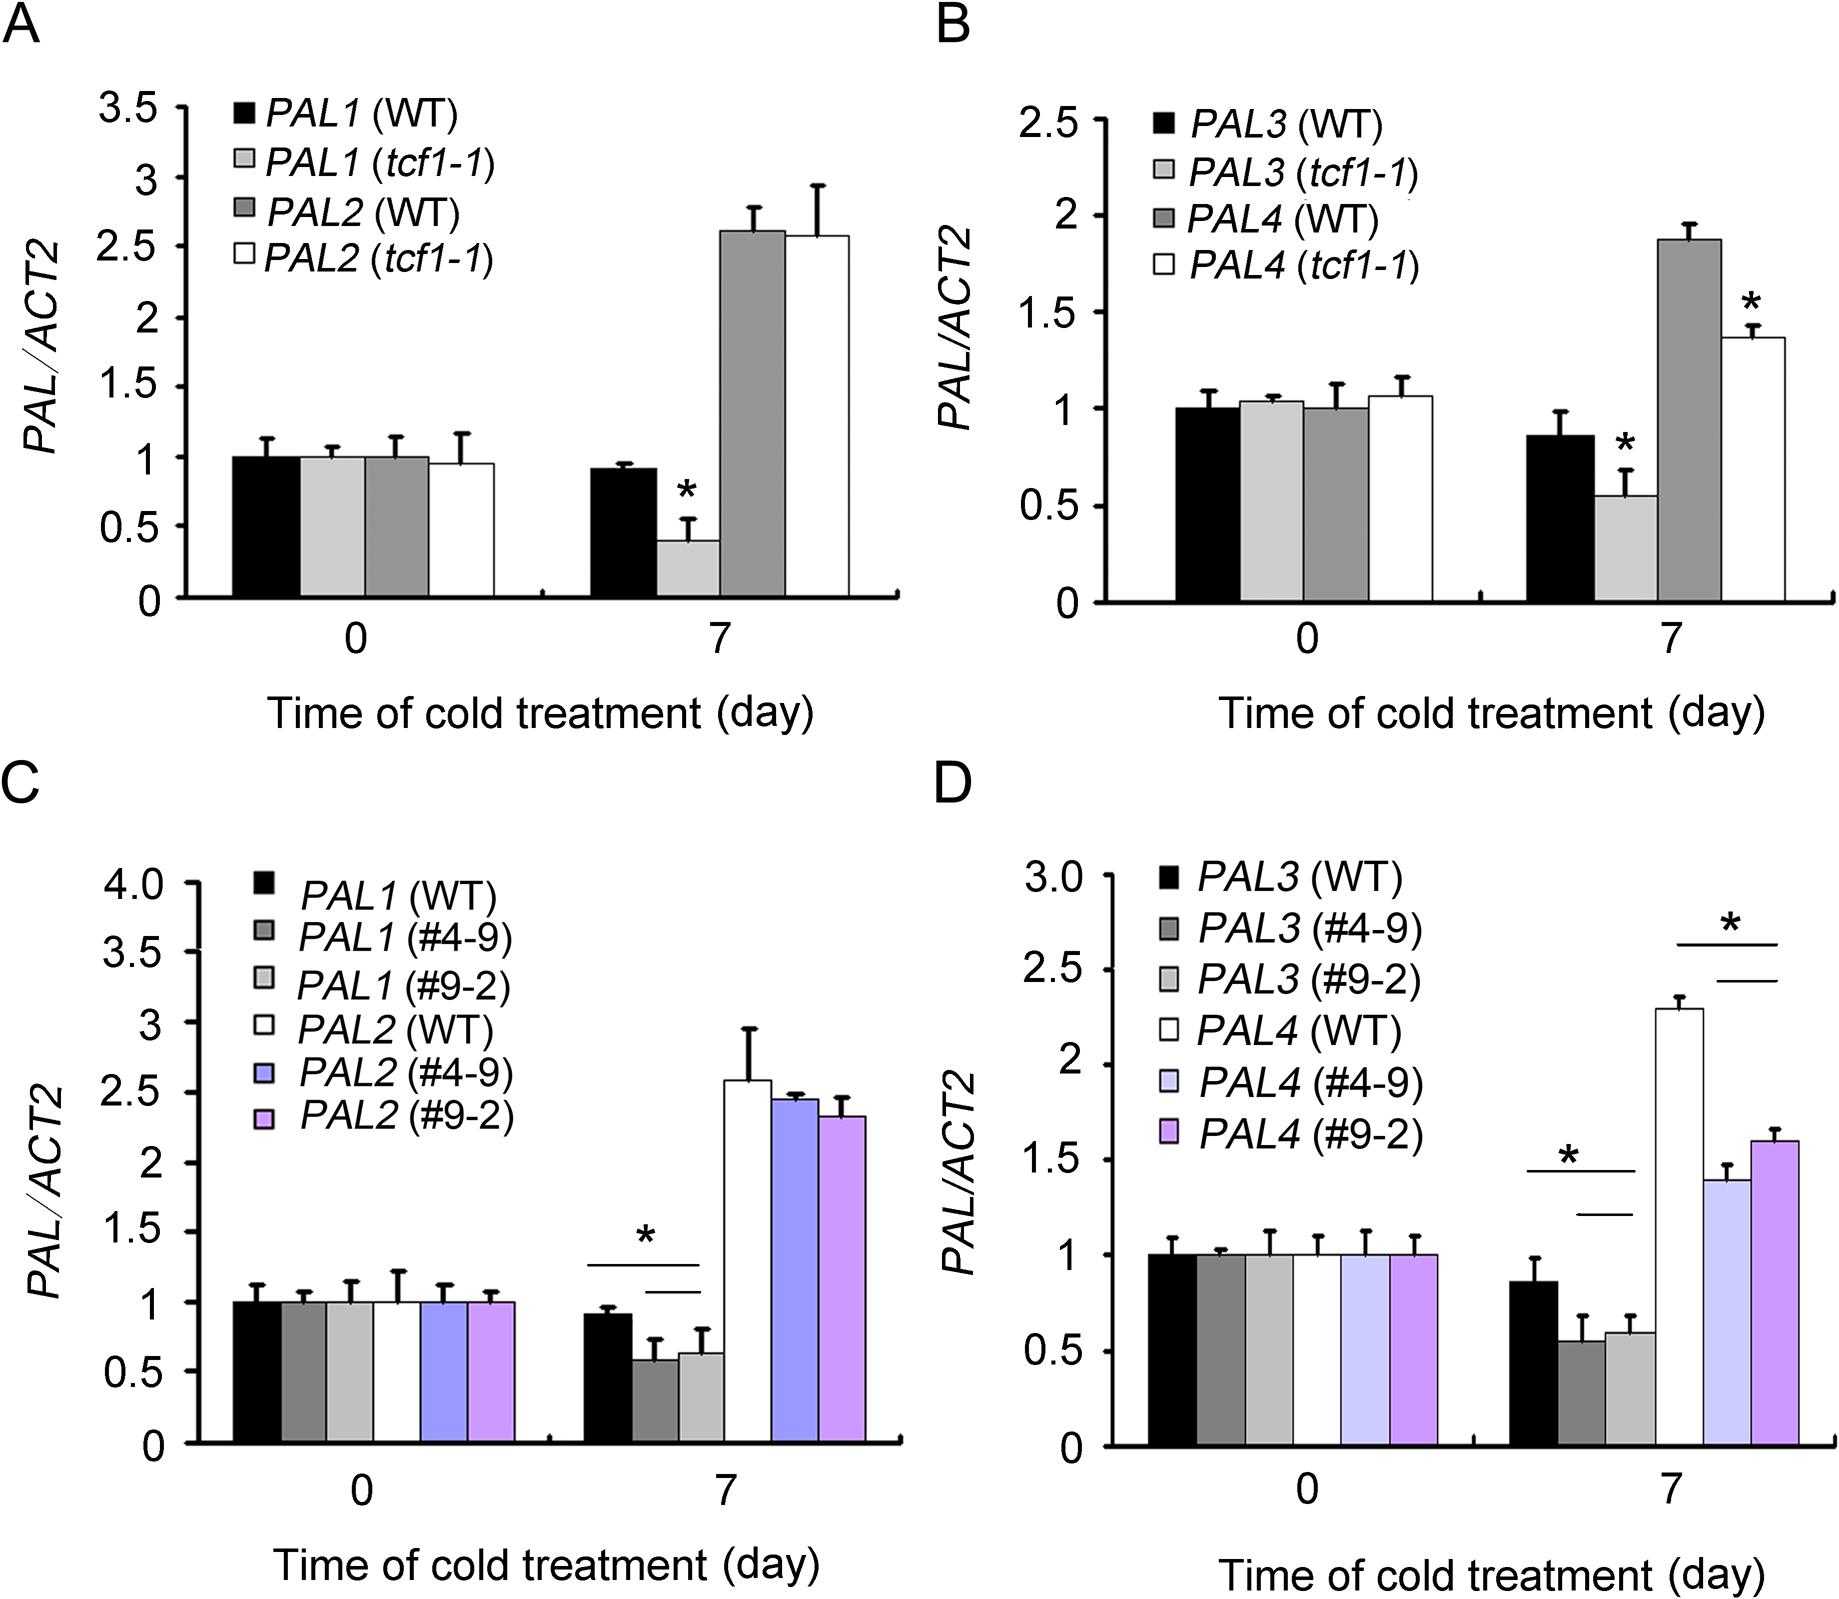 Expression analysis of <i>PAL</i> genes in <i>tcf1</i> and <i>amiRNA-BCB</i> mutants.